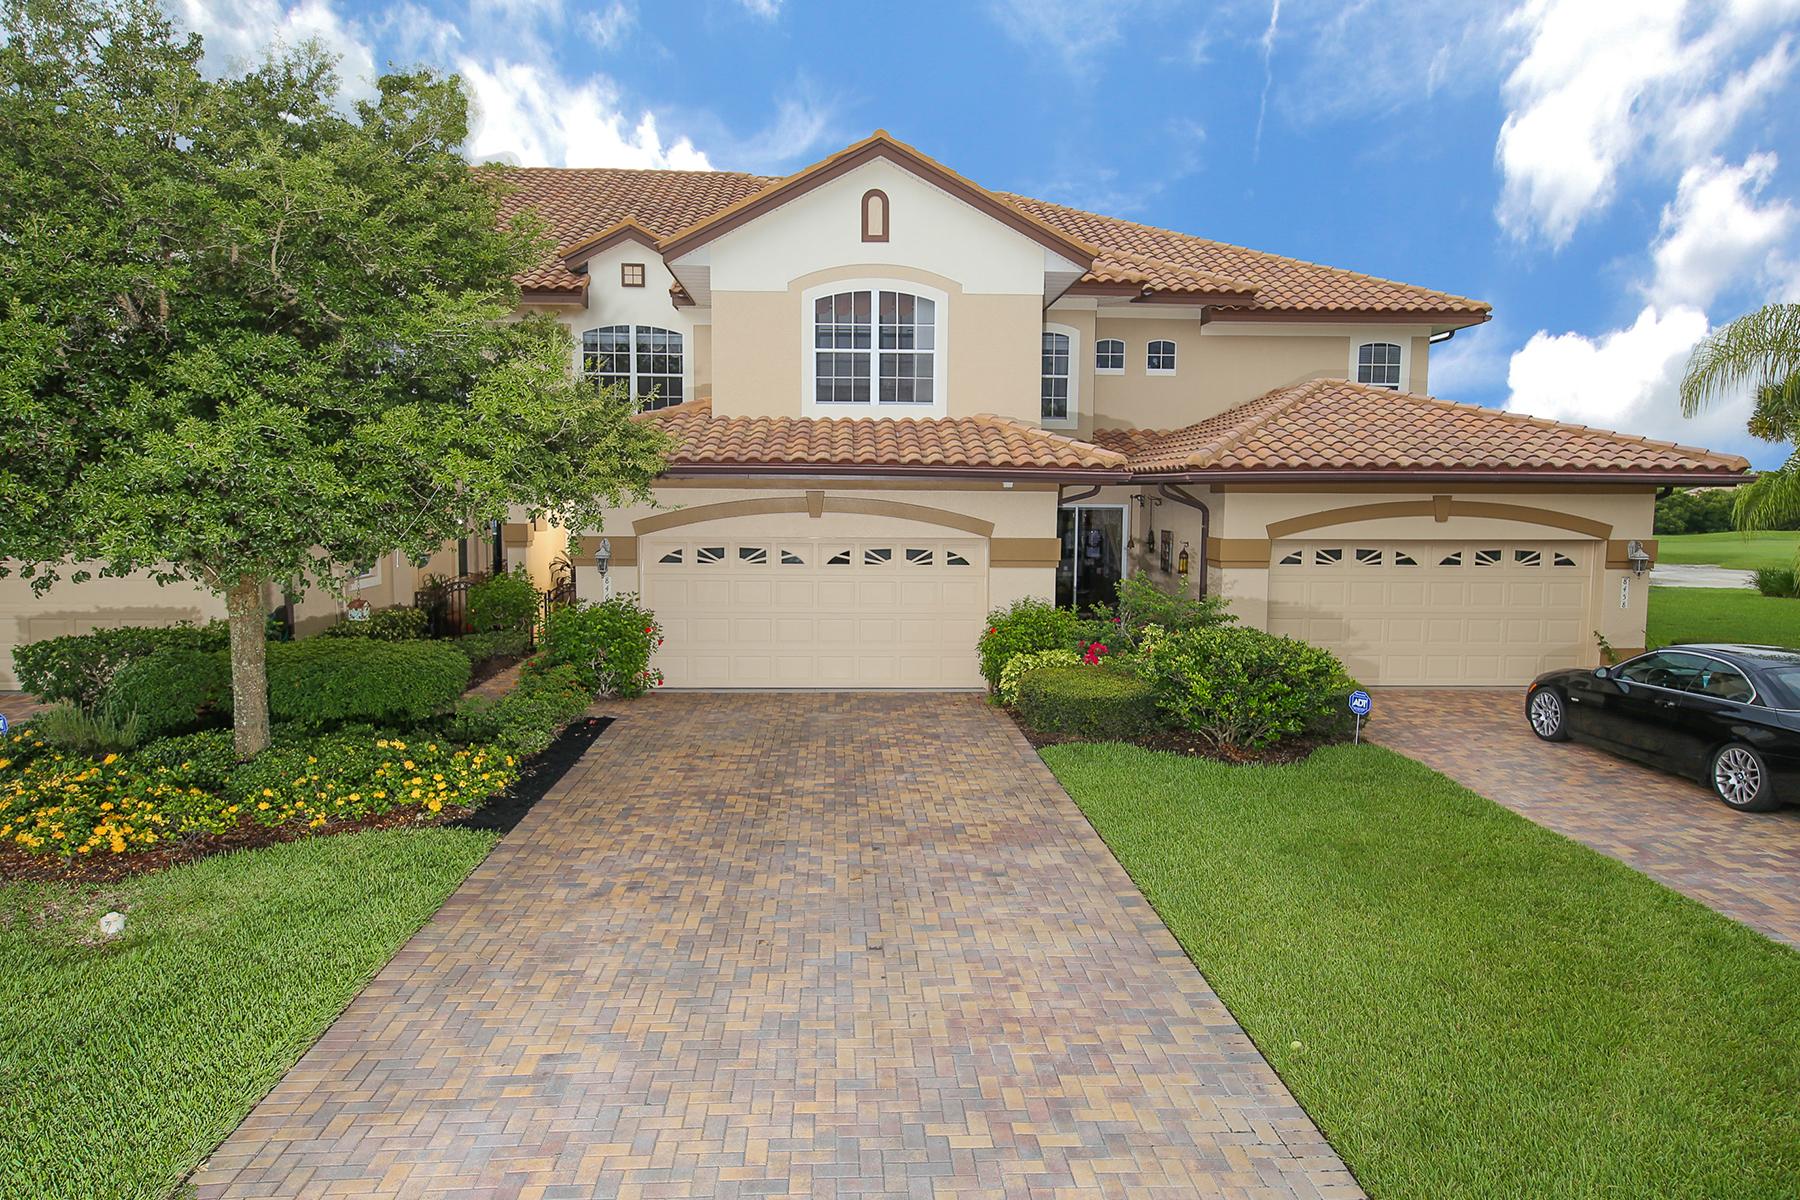 Townhouse for Sale at MIRAMAR 8460 Miramar Way Lakewood Ranch, Florida 34202 United States